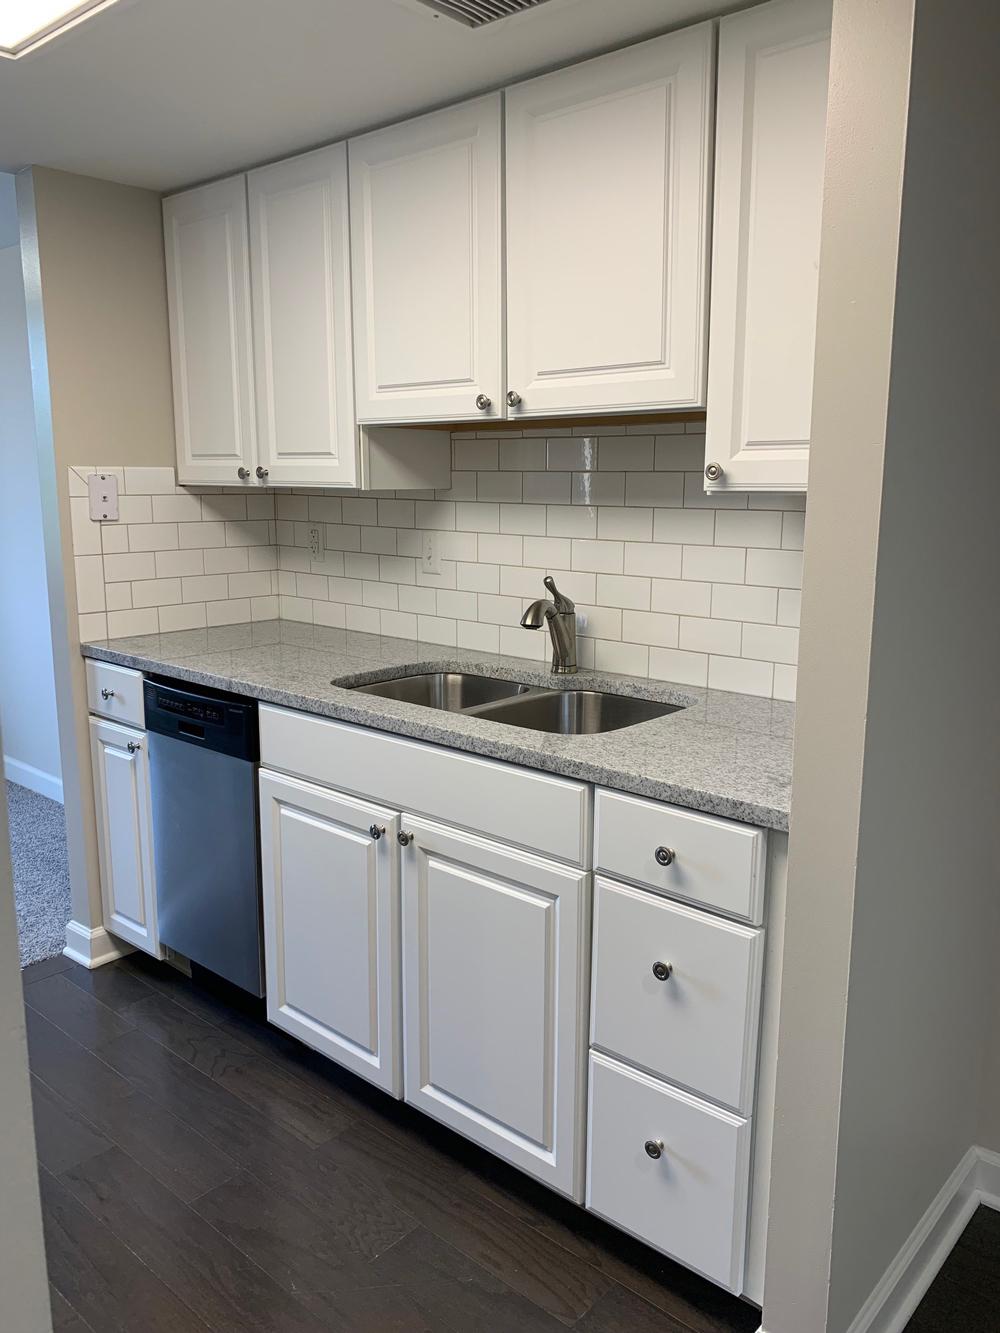 walk-through kitchen in The Brennan independent living apartment